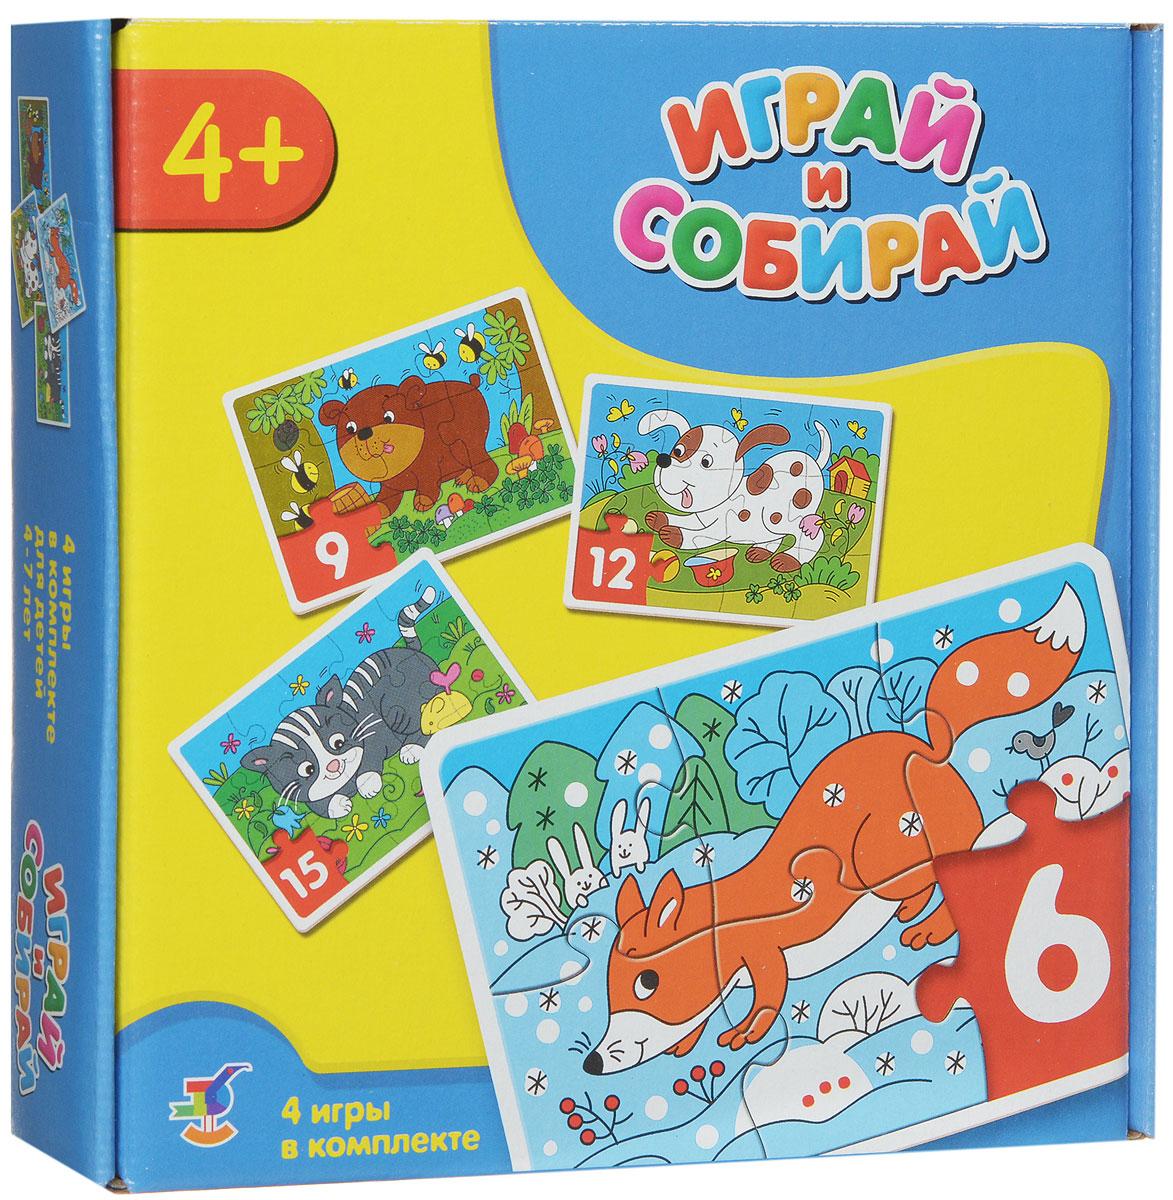 Дрофа-Медиа Пазл для малышей Играй и собирай 4 в 1 2947 дрофа медиа пазл для малышей играй и собирай 4 в 1 2938